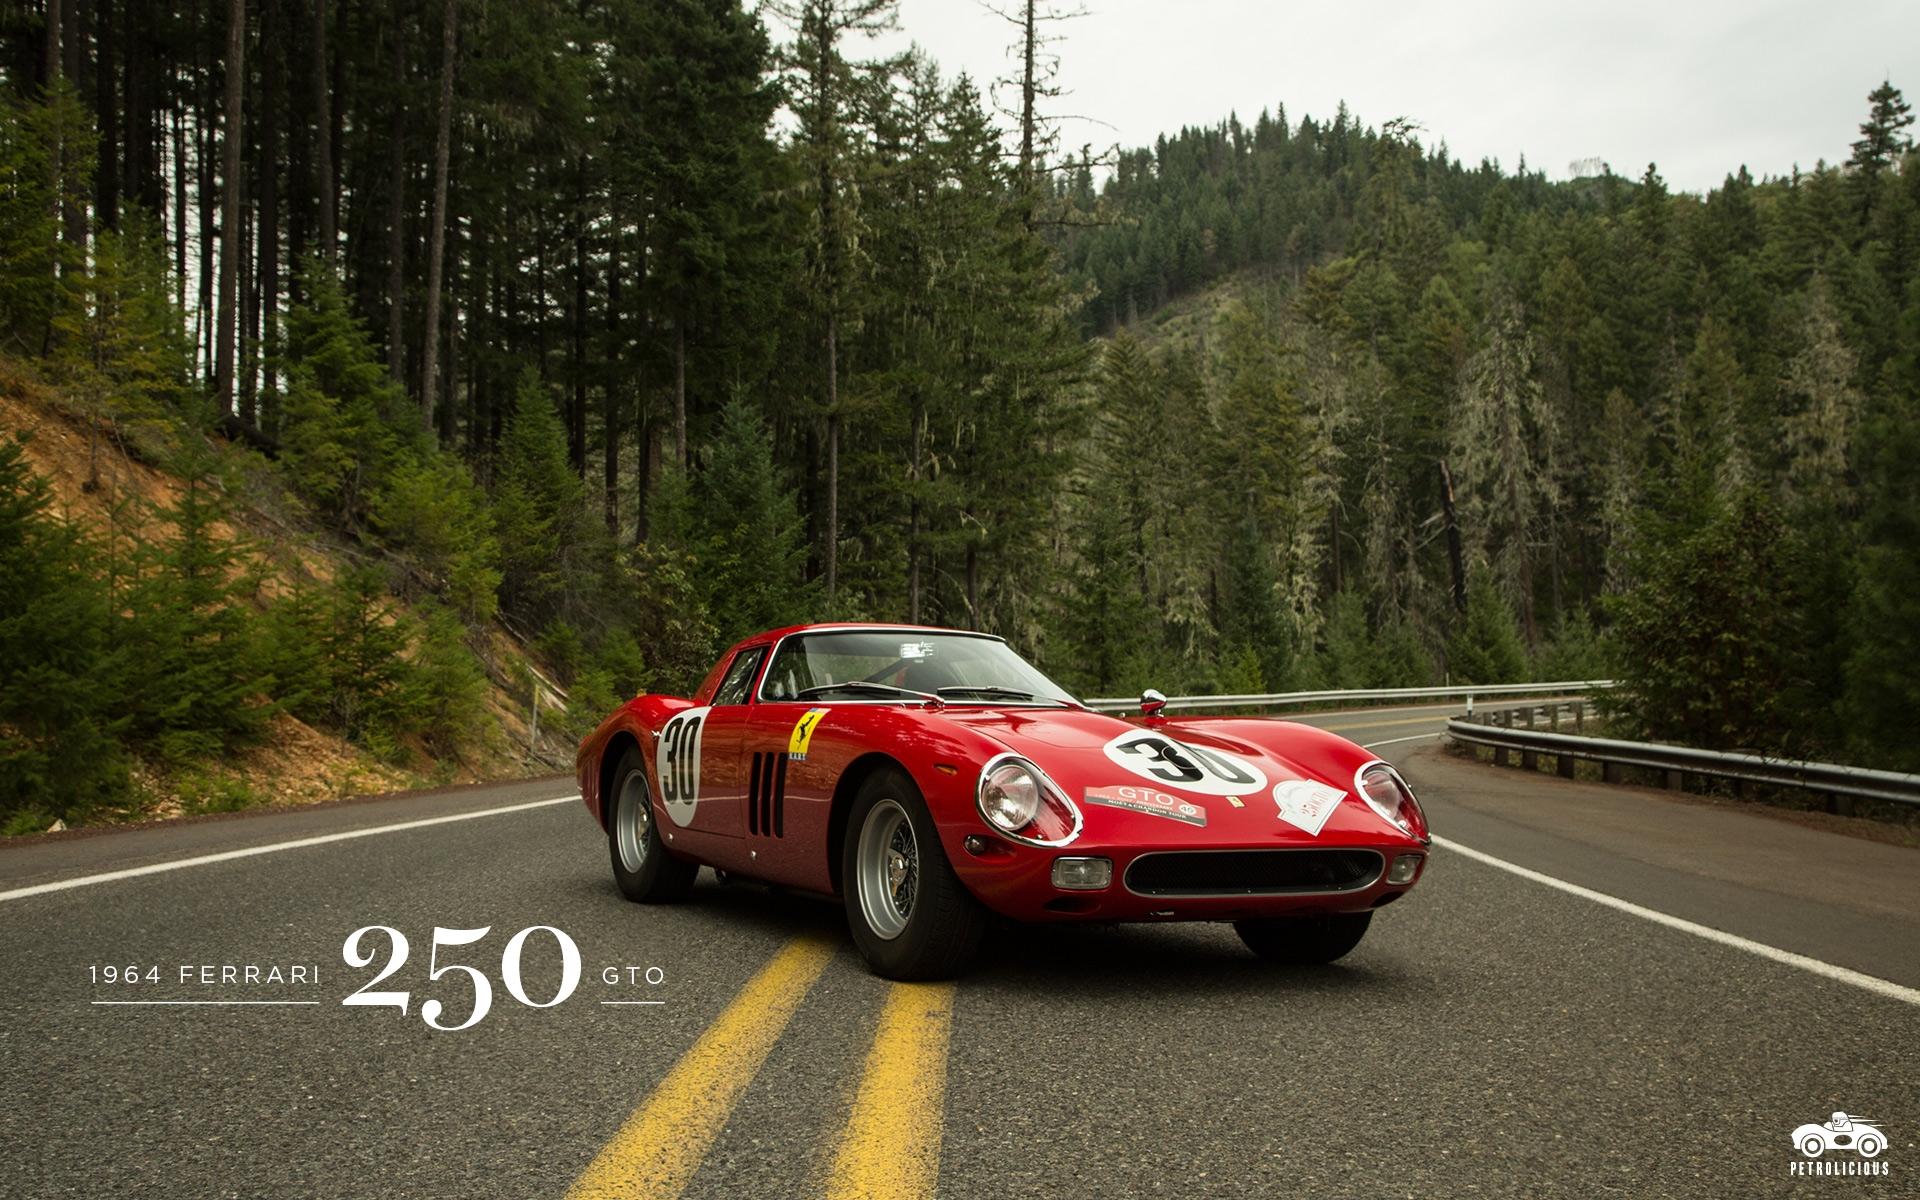 ferrari 250 GTO Wallpaper 7   1920 X 1200 stmednet 1920x1200